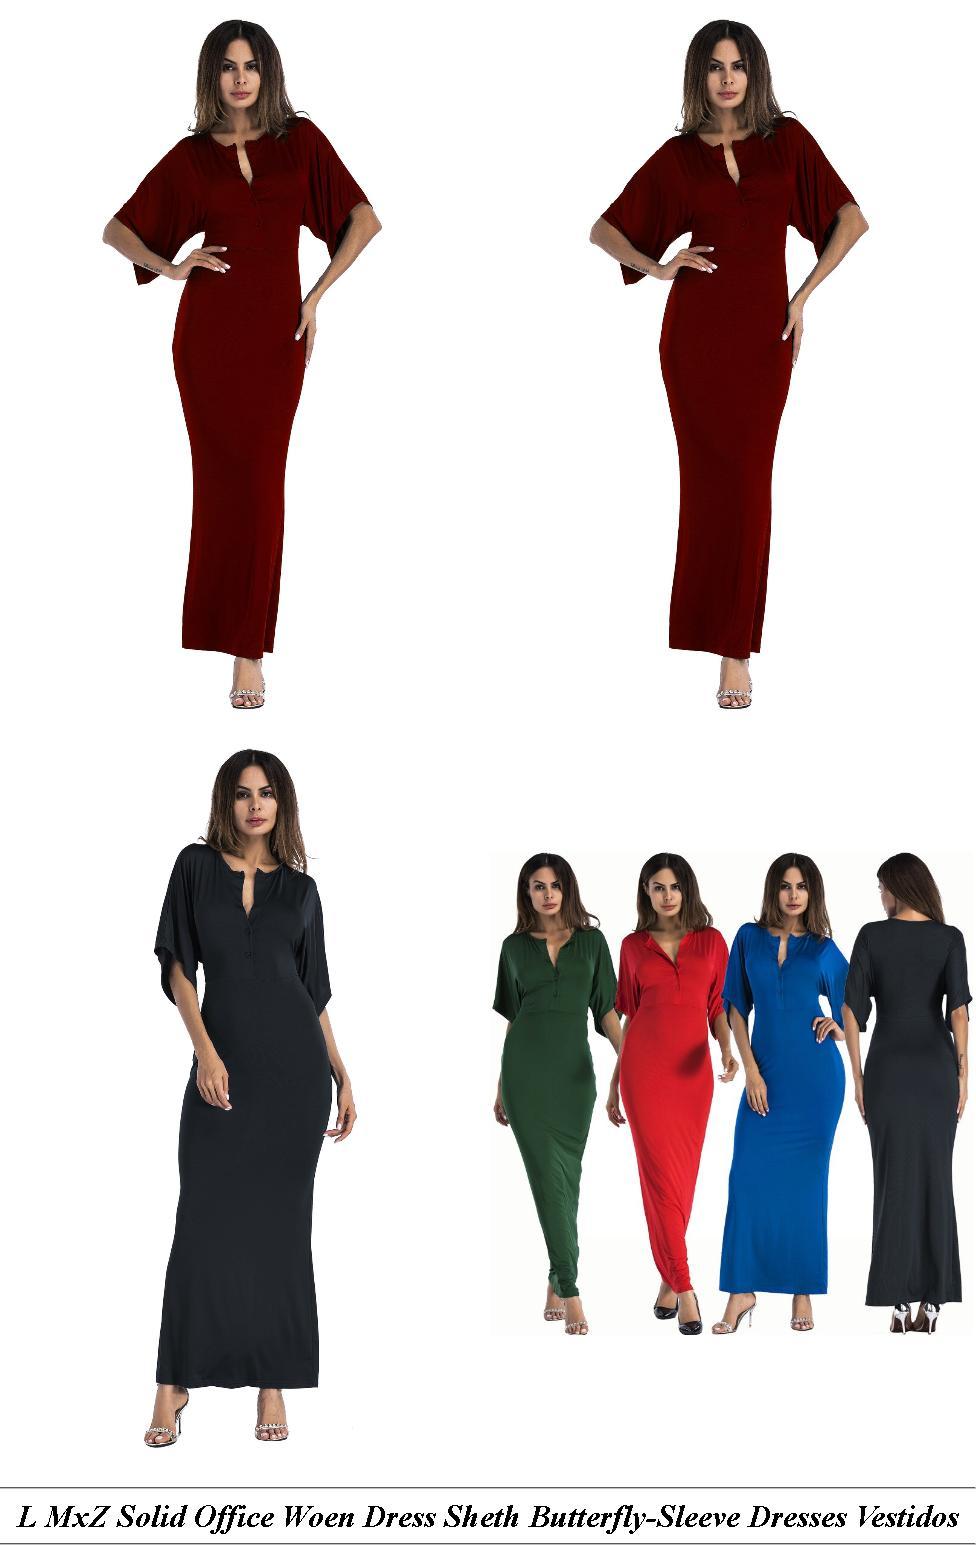 Lack Prom Dresses Long - Clearance Sale Dresses Uk - Designer Dresses Warehouse Online Usa